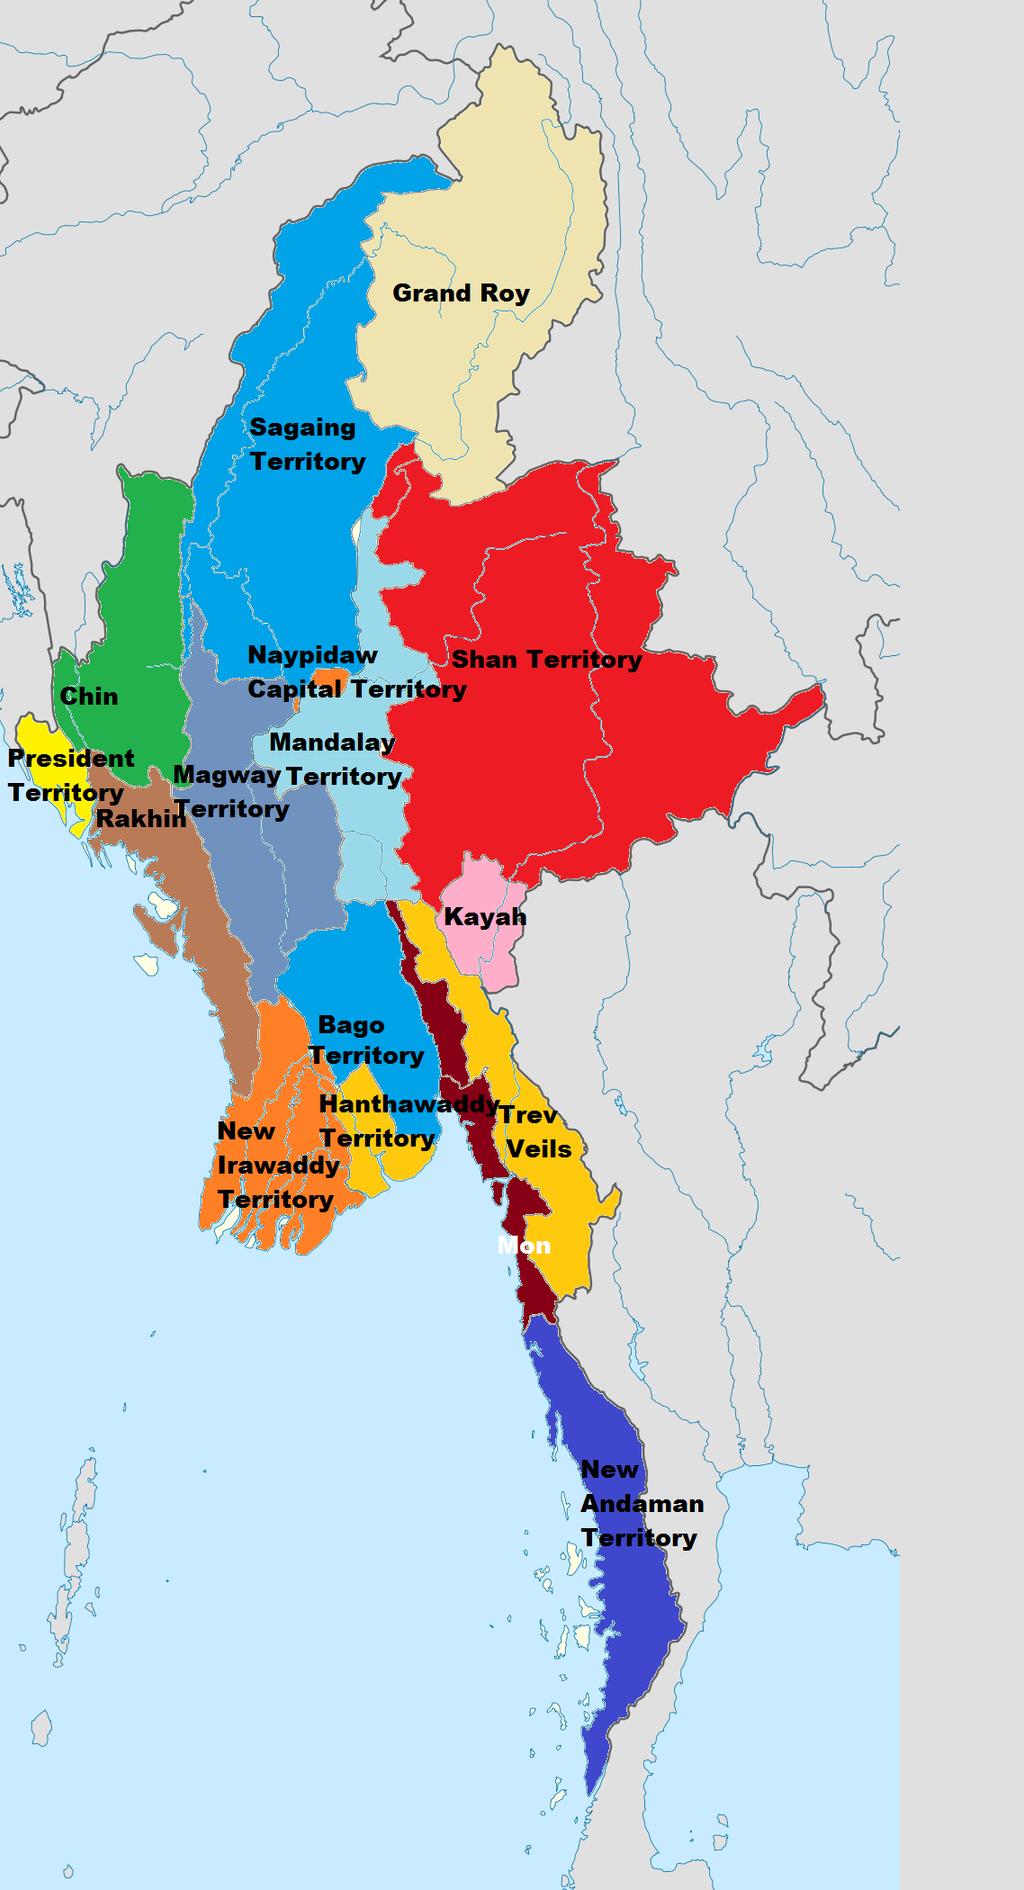 Myanmar - Divisions and States - Myanmar | ReliefWeb